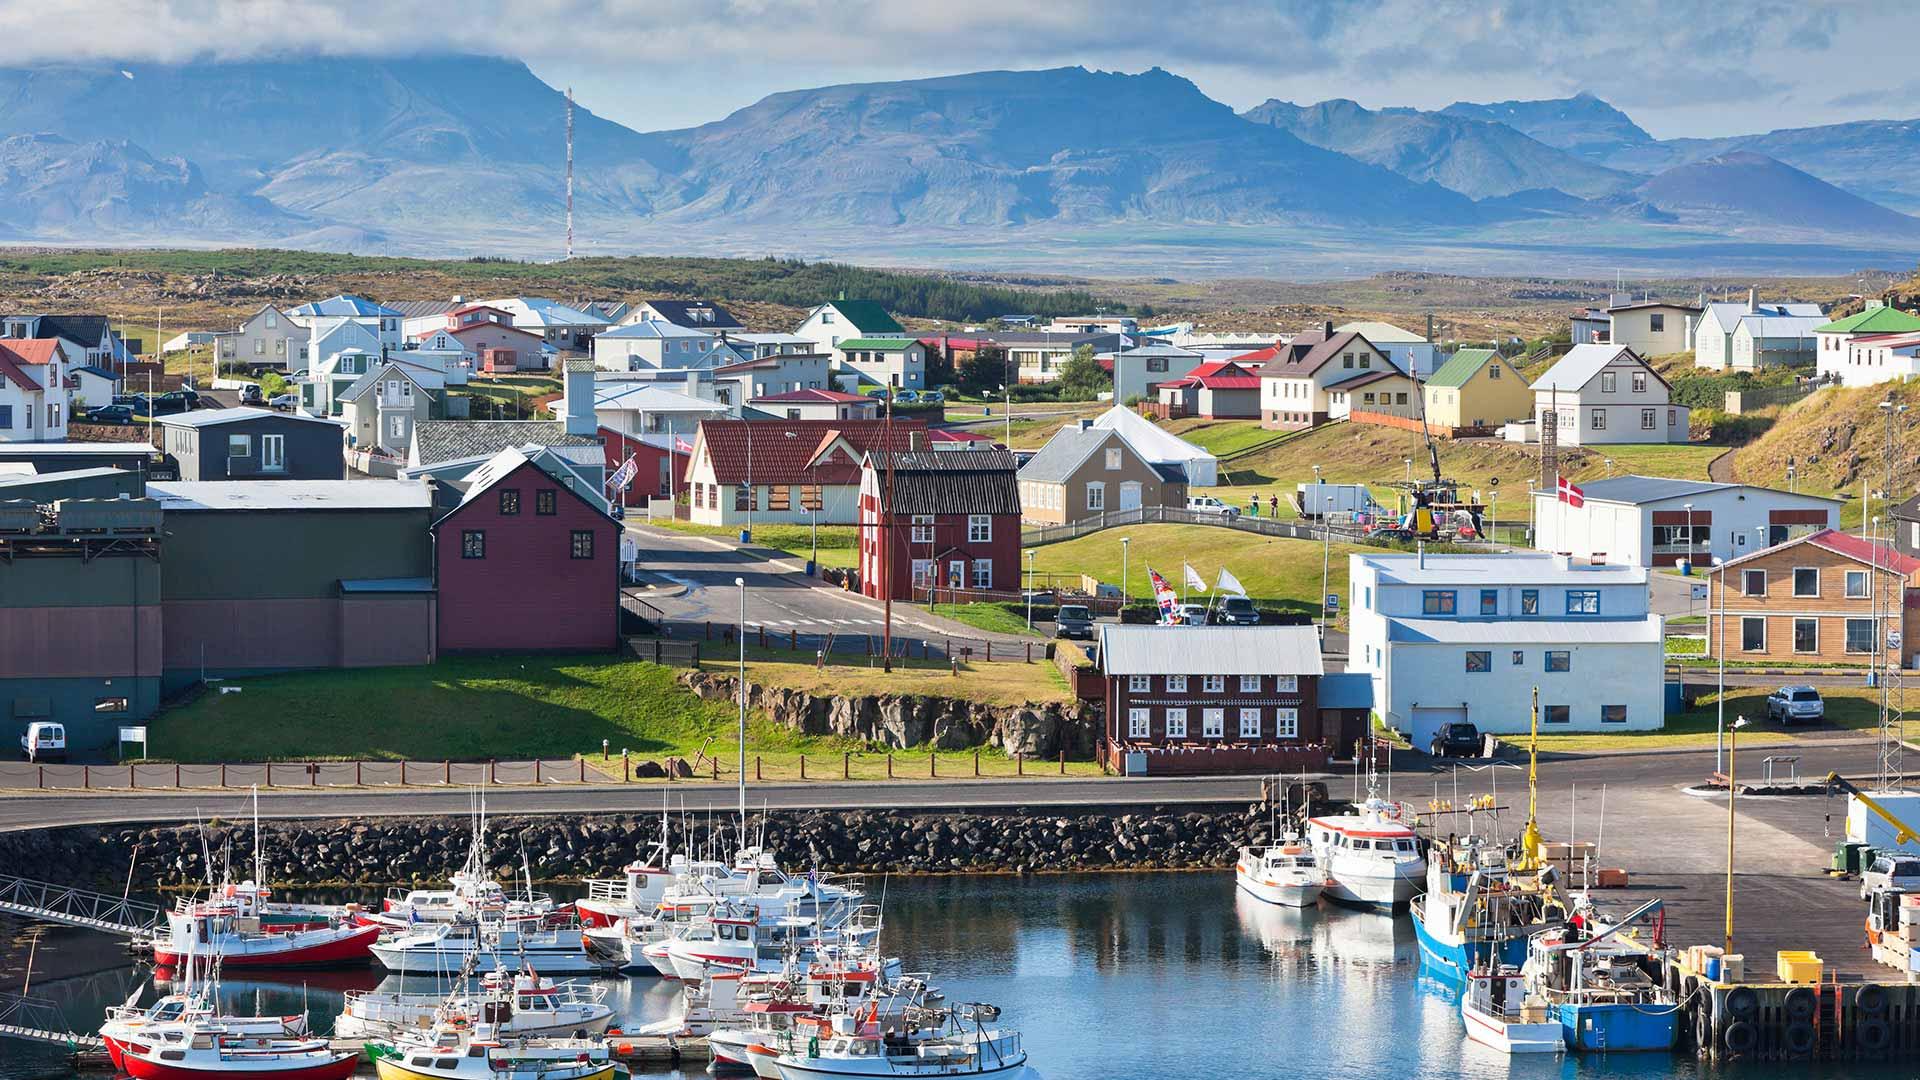 Reykjavik City Day Tour